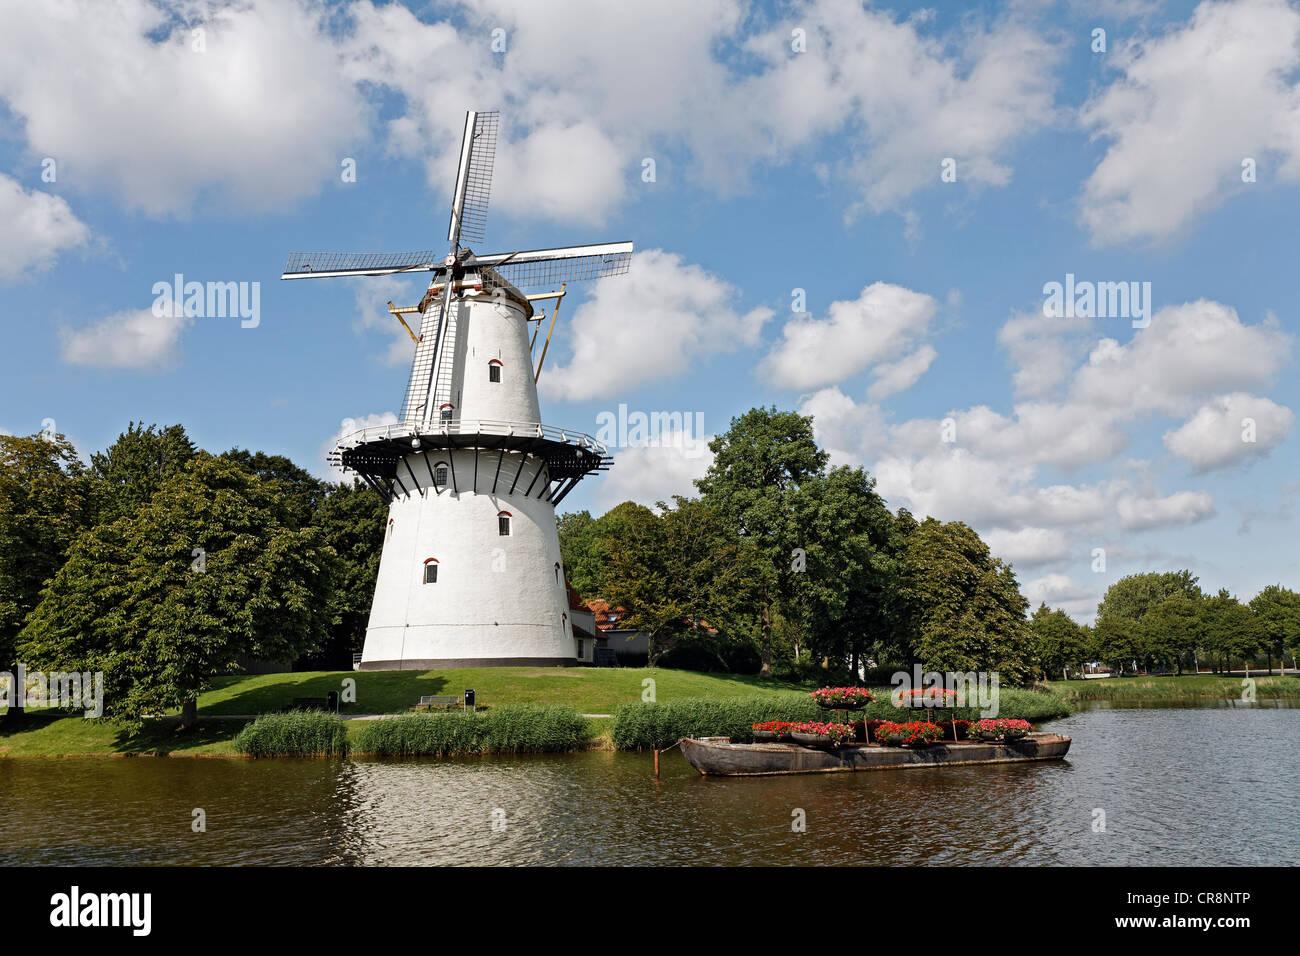 Historic Dutch windmill De Hoop, Middelburg, Walcheren, Zeeland, Netherlands, Europe Stock Photo